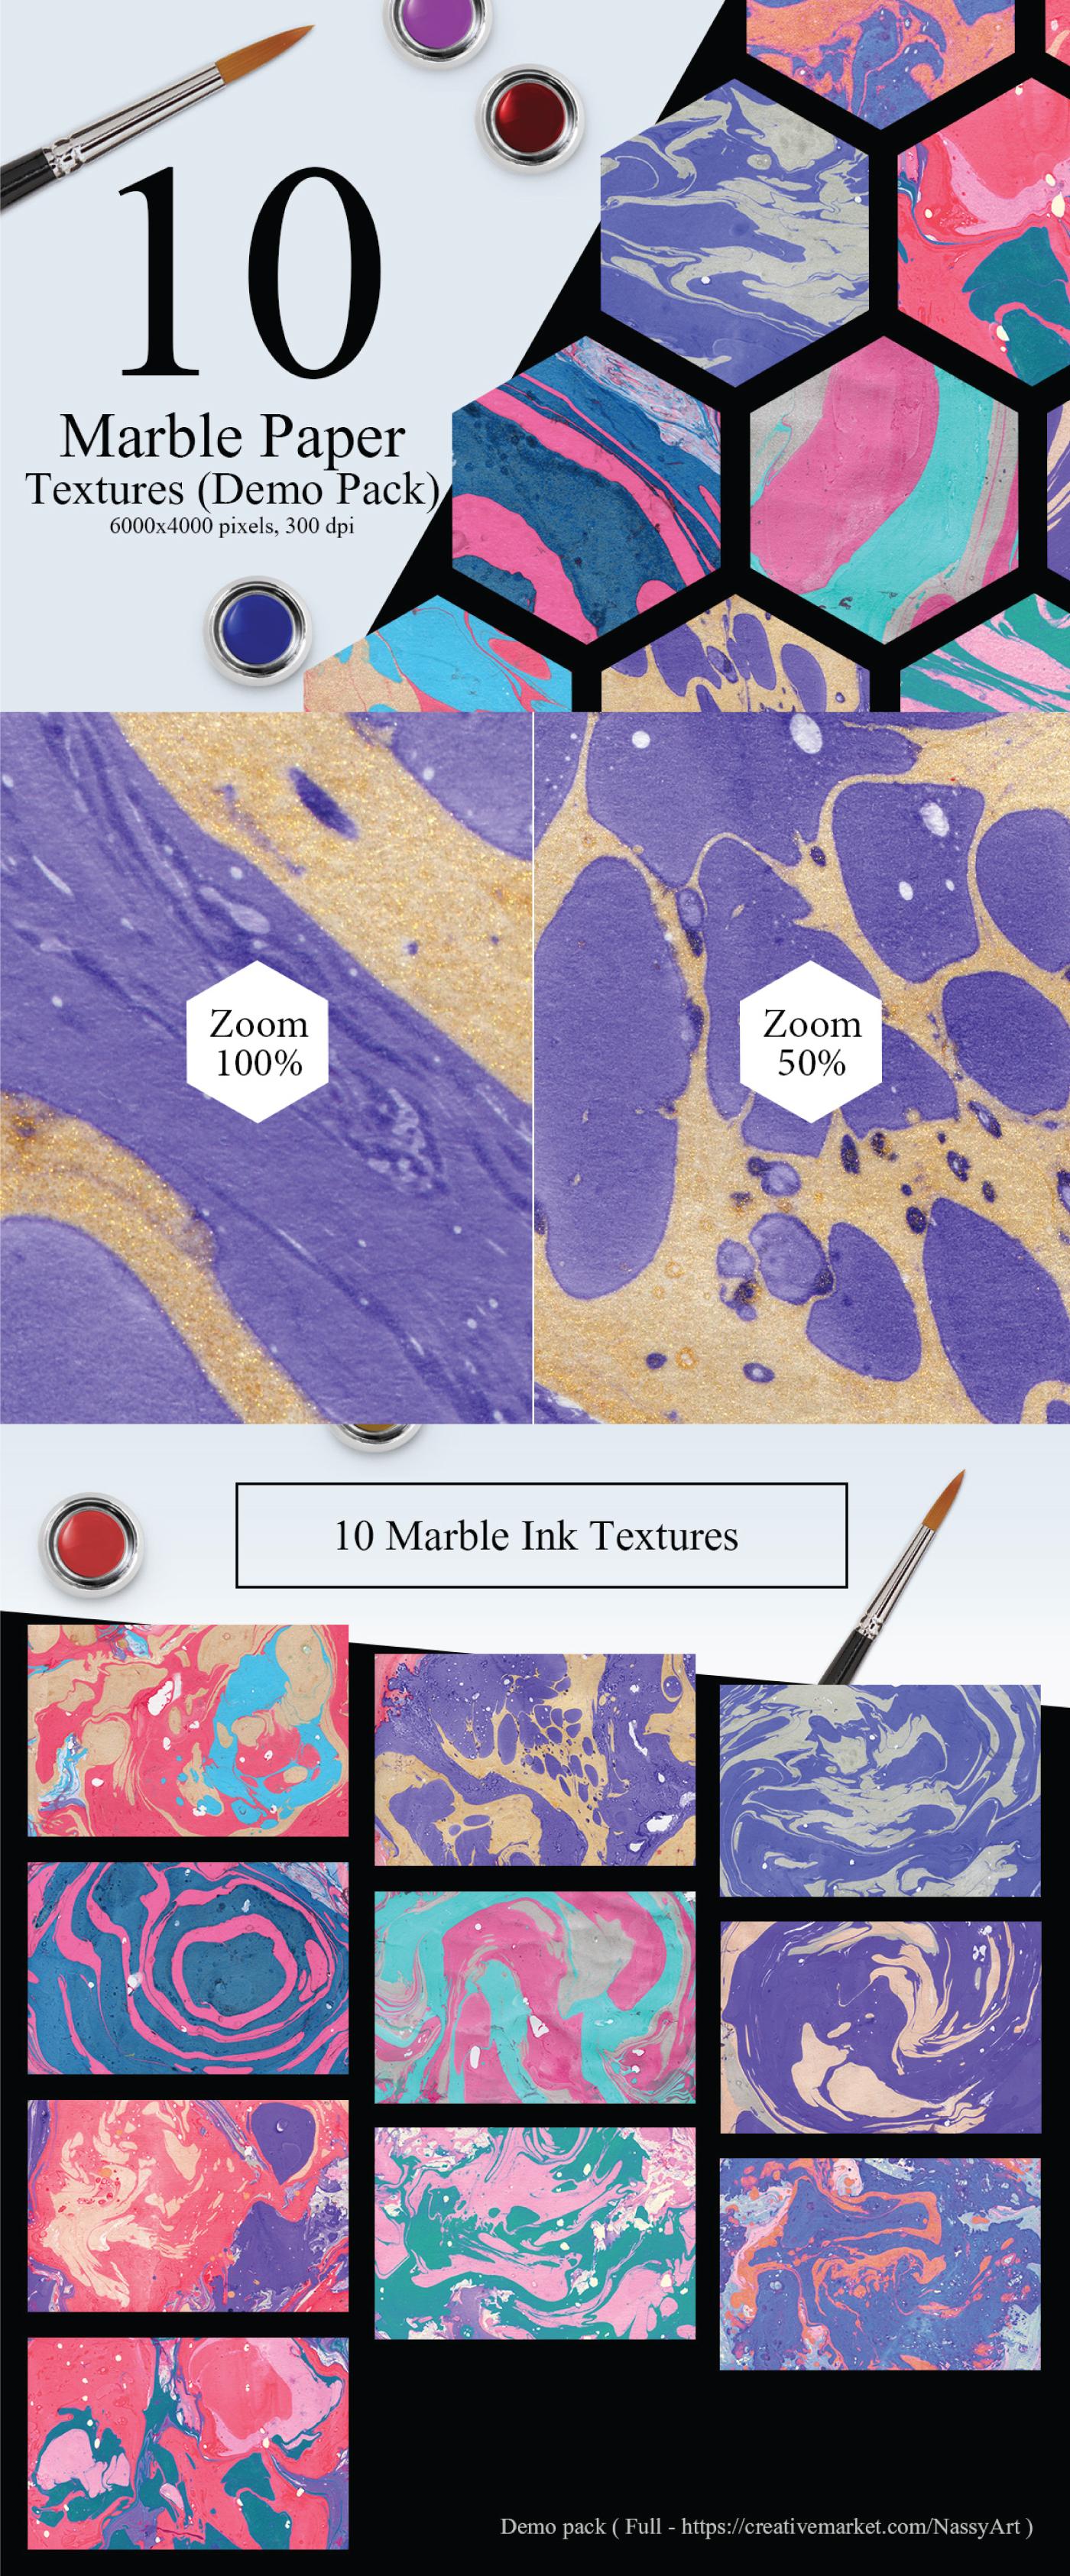 10-Marble-Ink-Textures-LONG.jpg